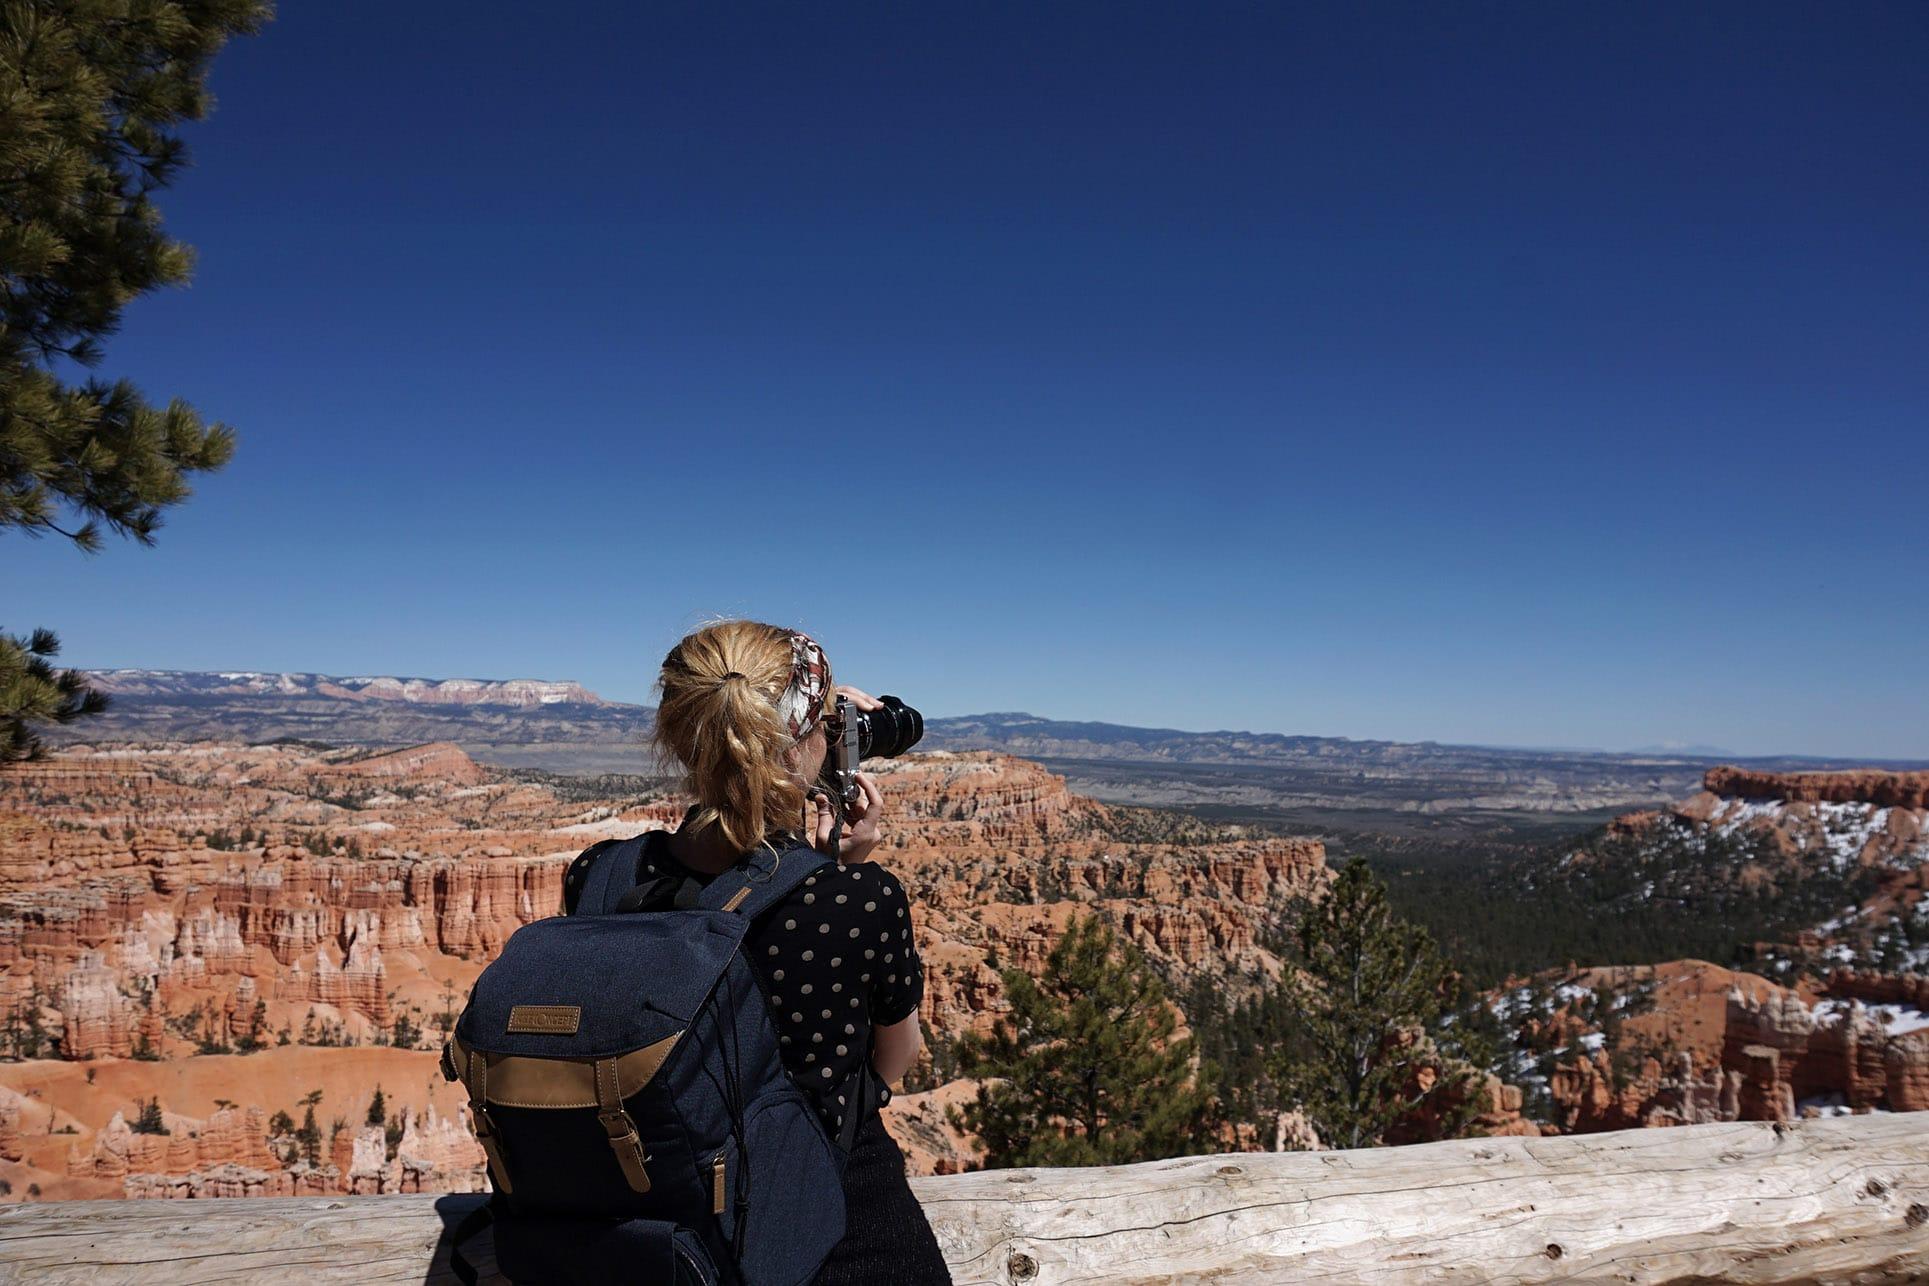 Parc National USA ciel bleu lykorne prend photo amphithéâtre roche ocre scenic drive  Bryce Canyon